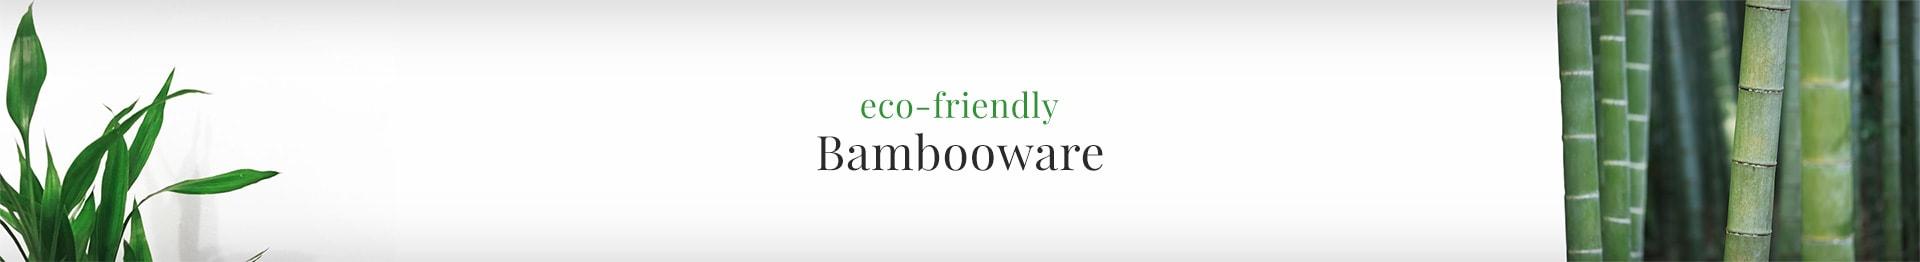 All Bambooware